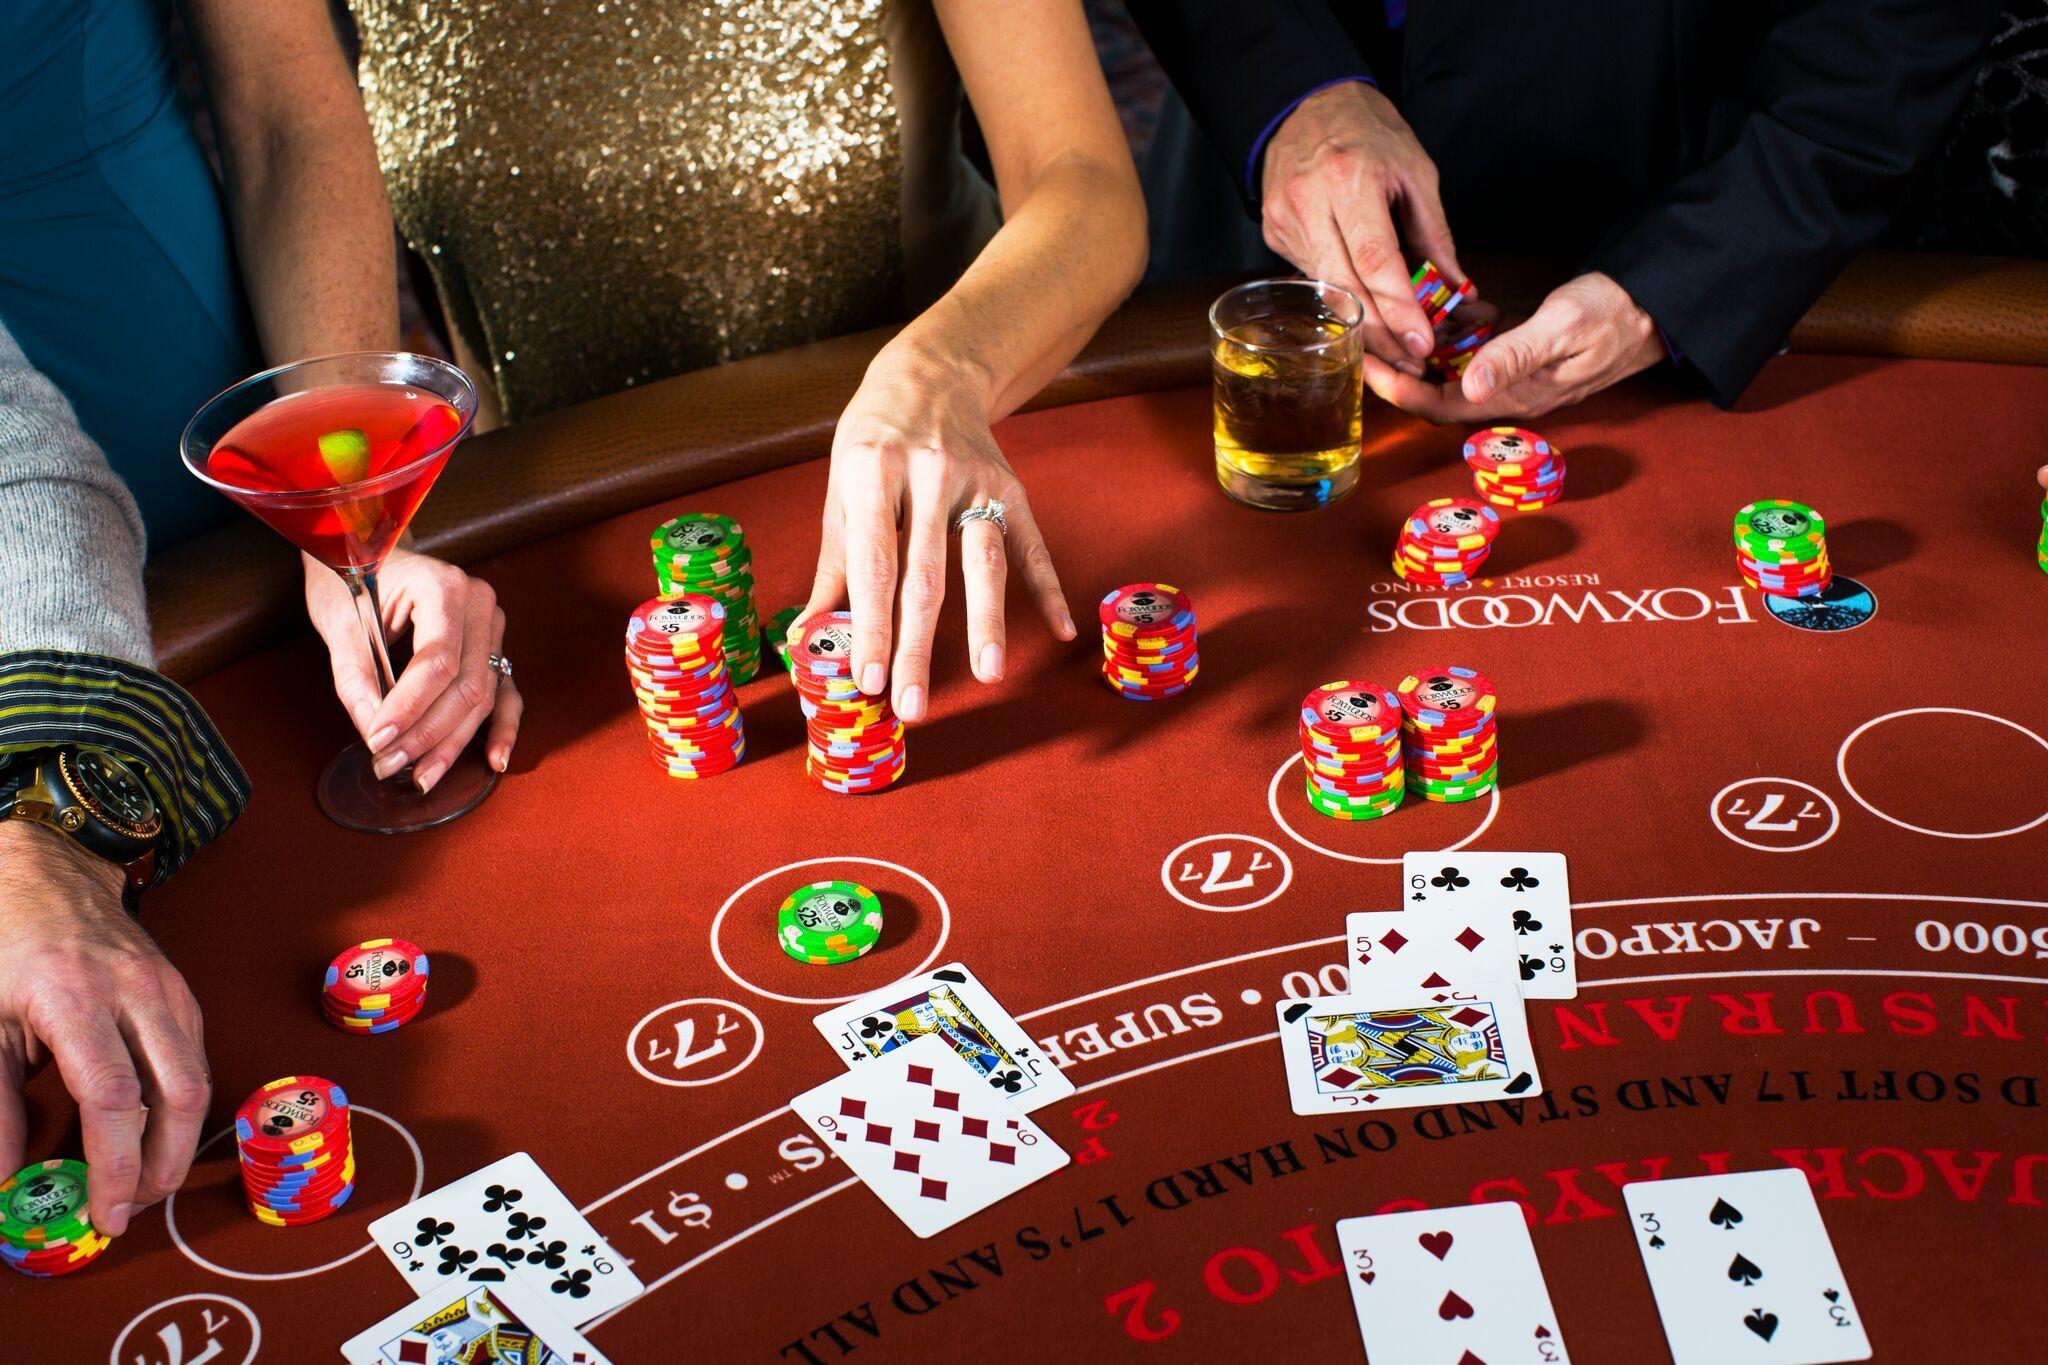 Casino venezia poker tornei